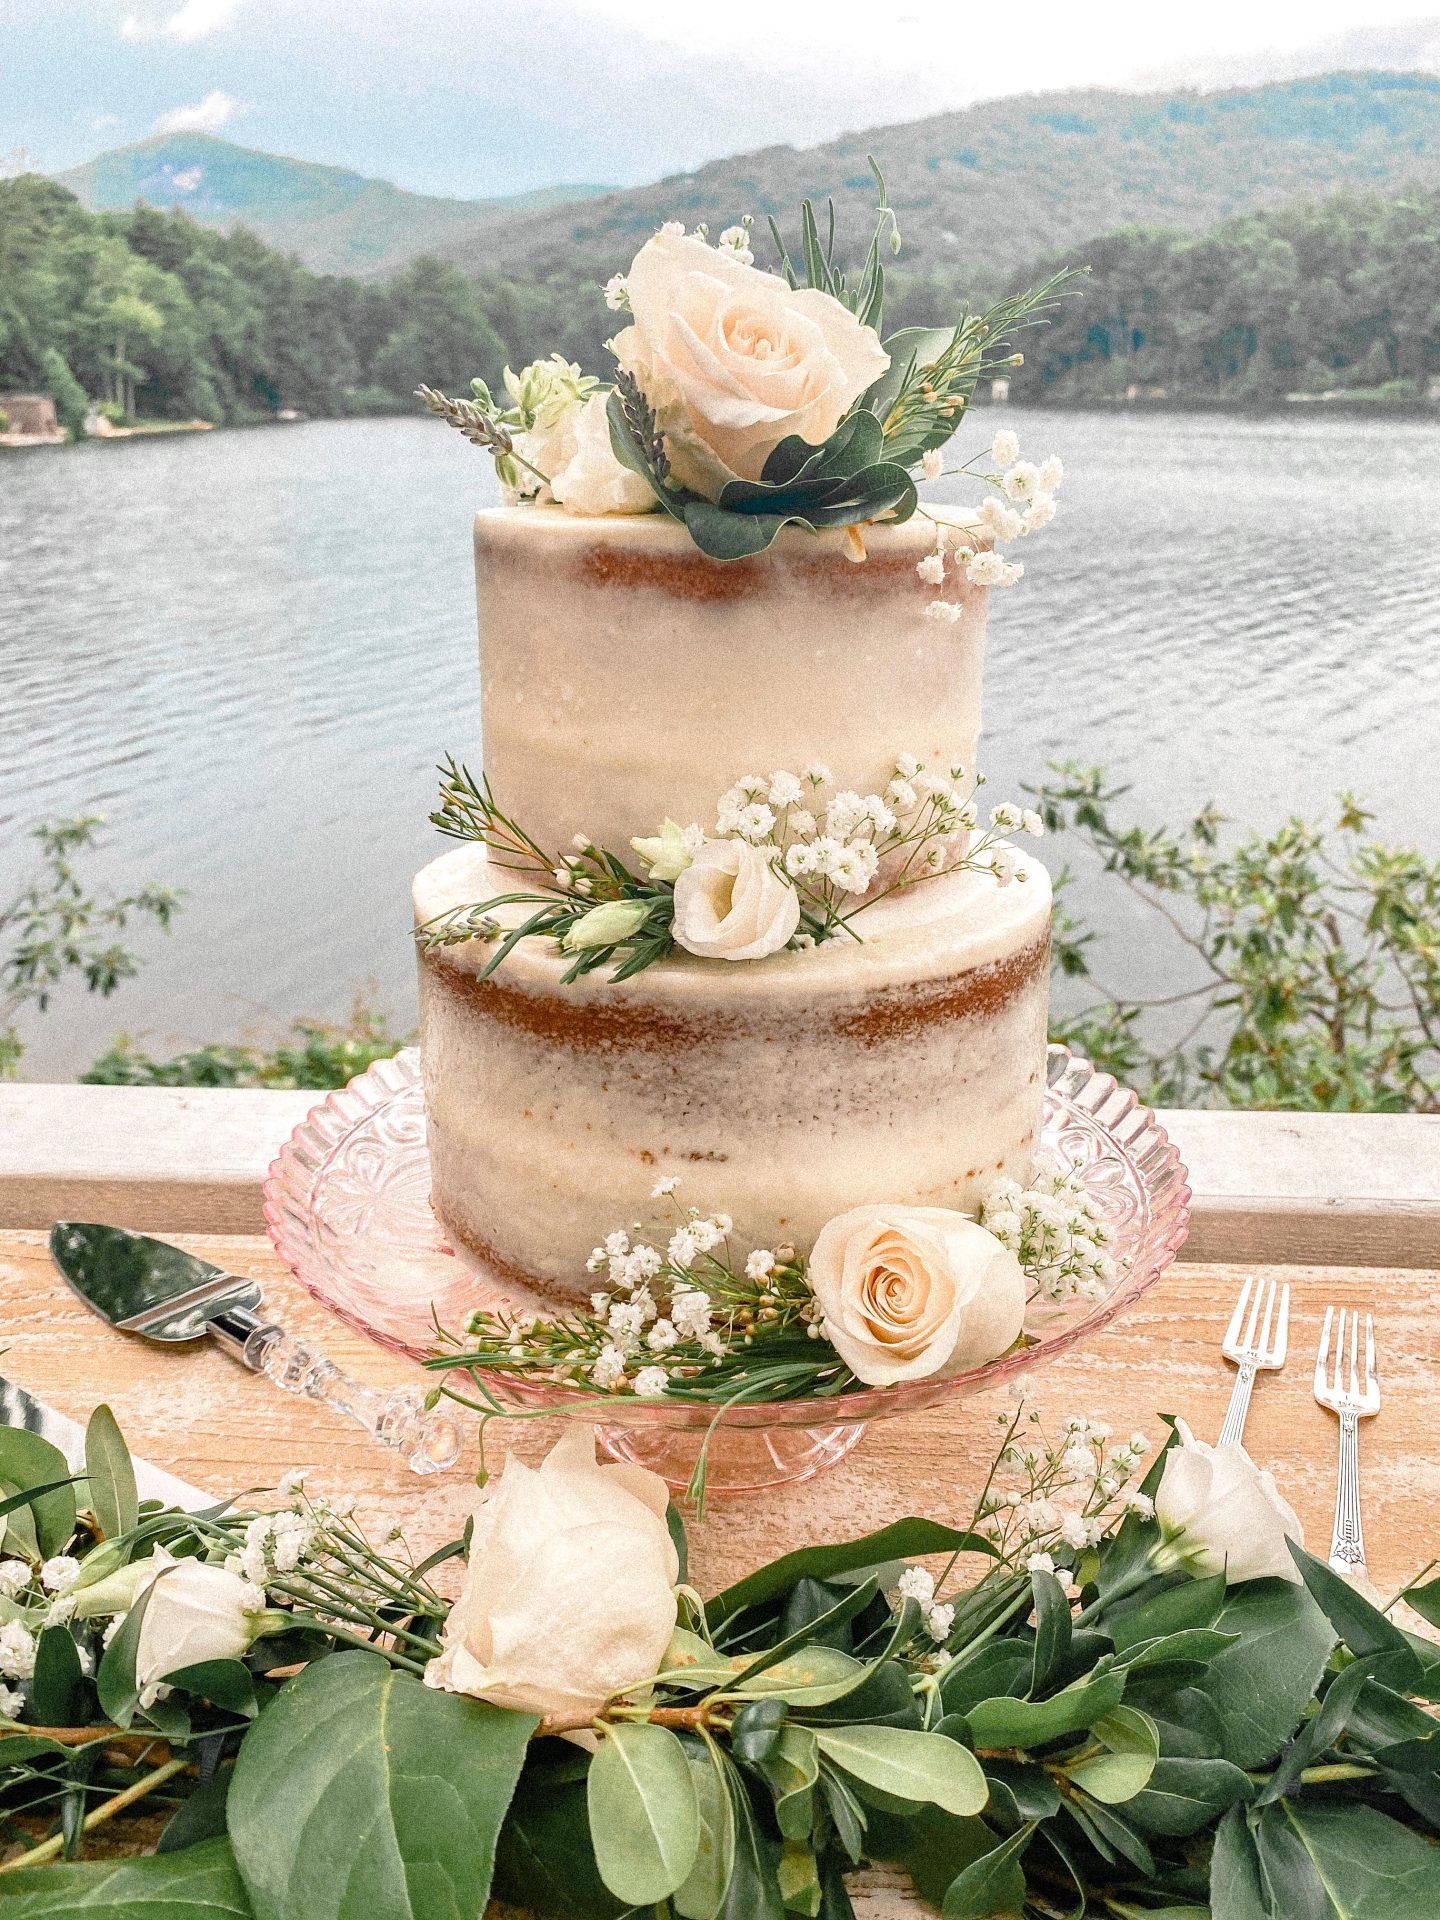 wedding cake, blue ridge bakery, Brevard, minimal, rustic, flowers, white cake, almond, the best wedding cake, greystone inn